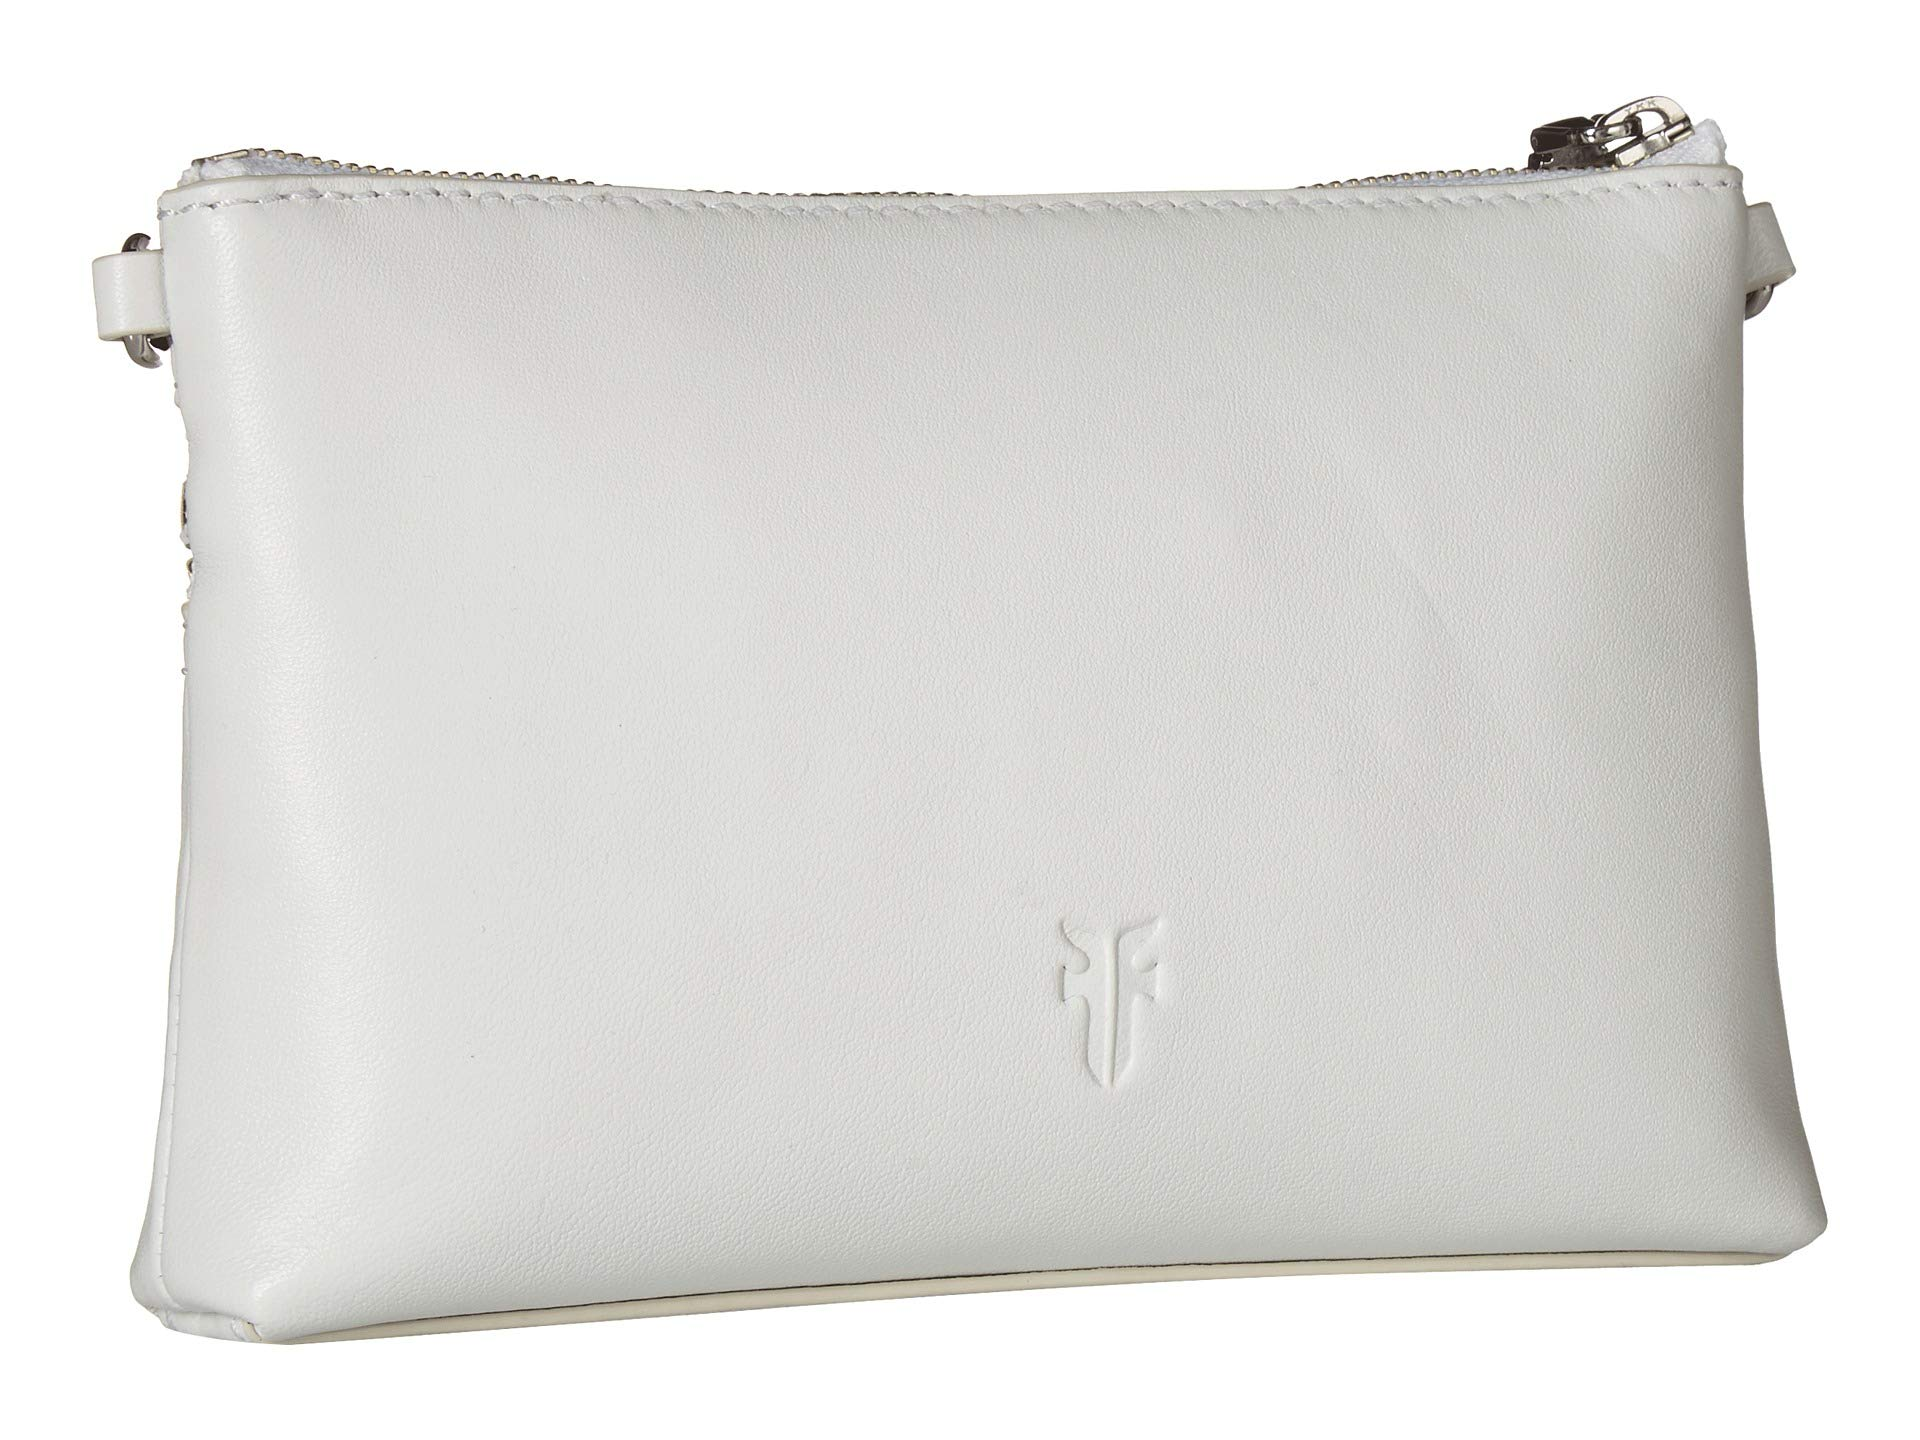 White Crossbody Zip Lambskin Soft Lena Wristlet Frye 5aIqEw5